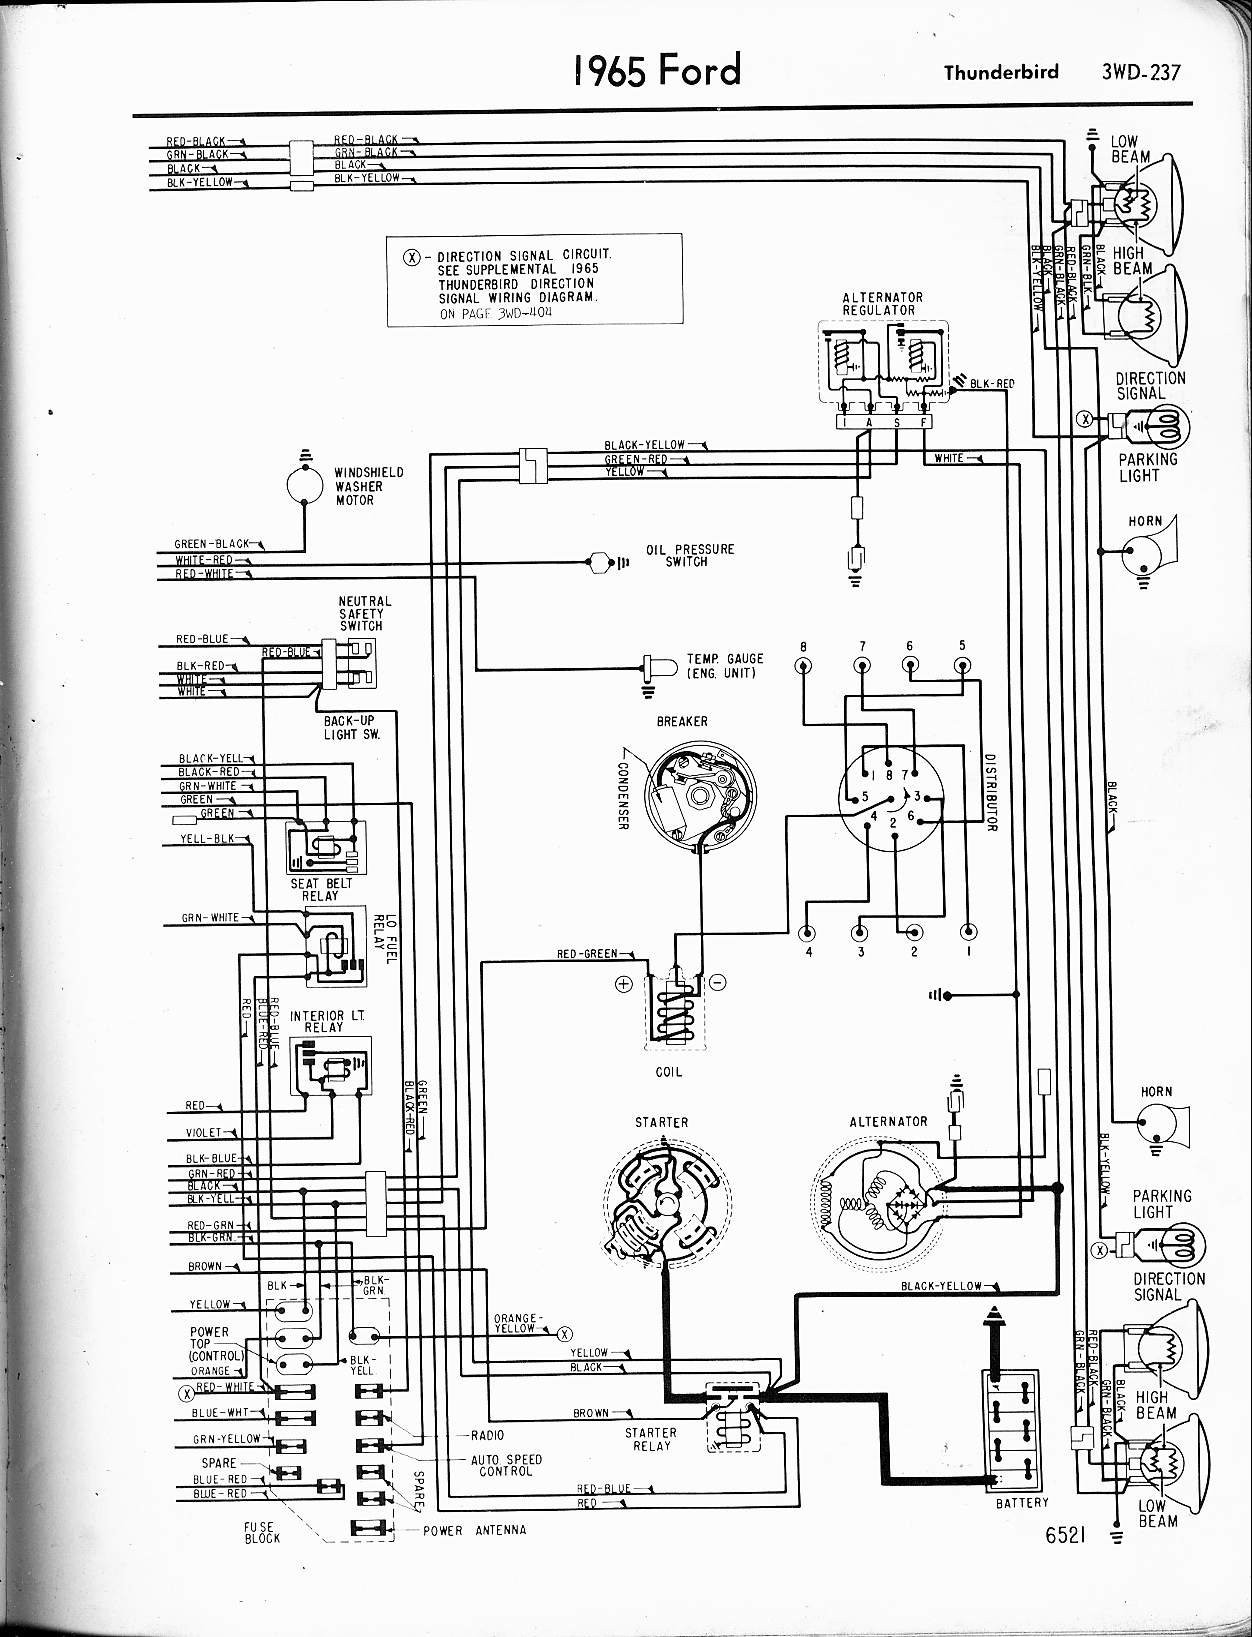 Mustang Starter solenoid Wiring Diagram Best 1965 Thunderbird Wiring Diagram Wiring Diagrams Schematics Inspirational